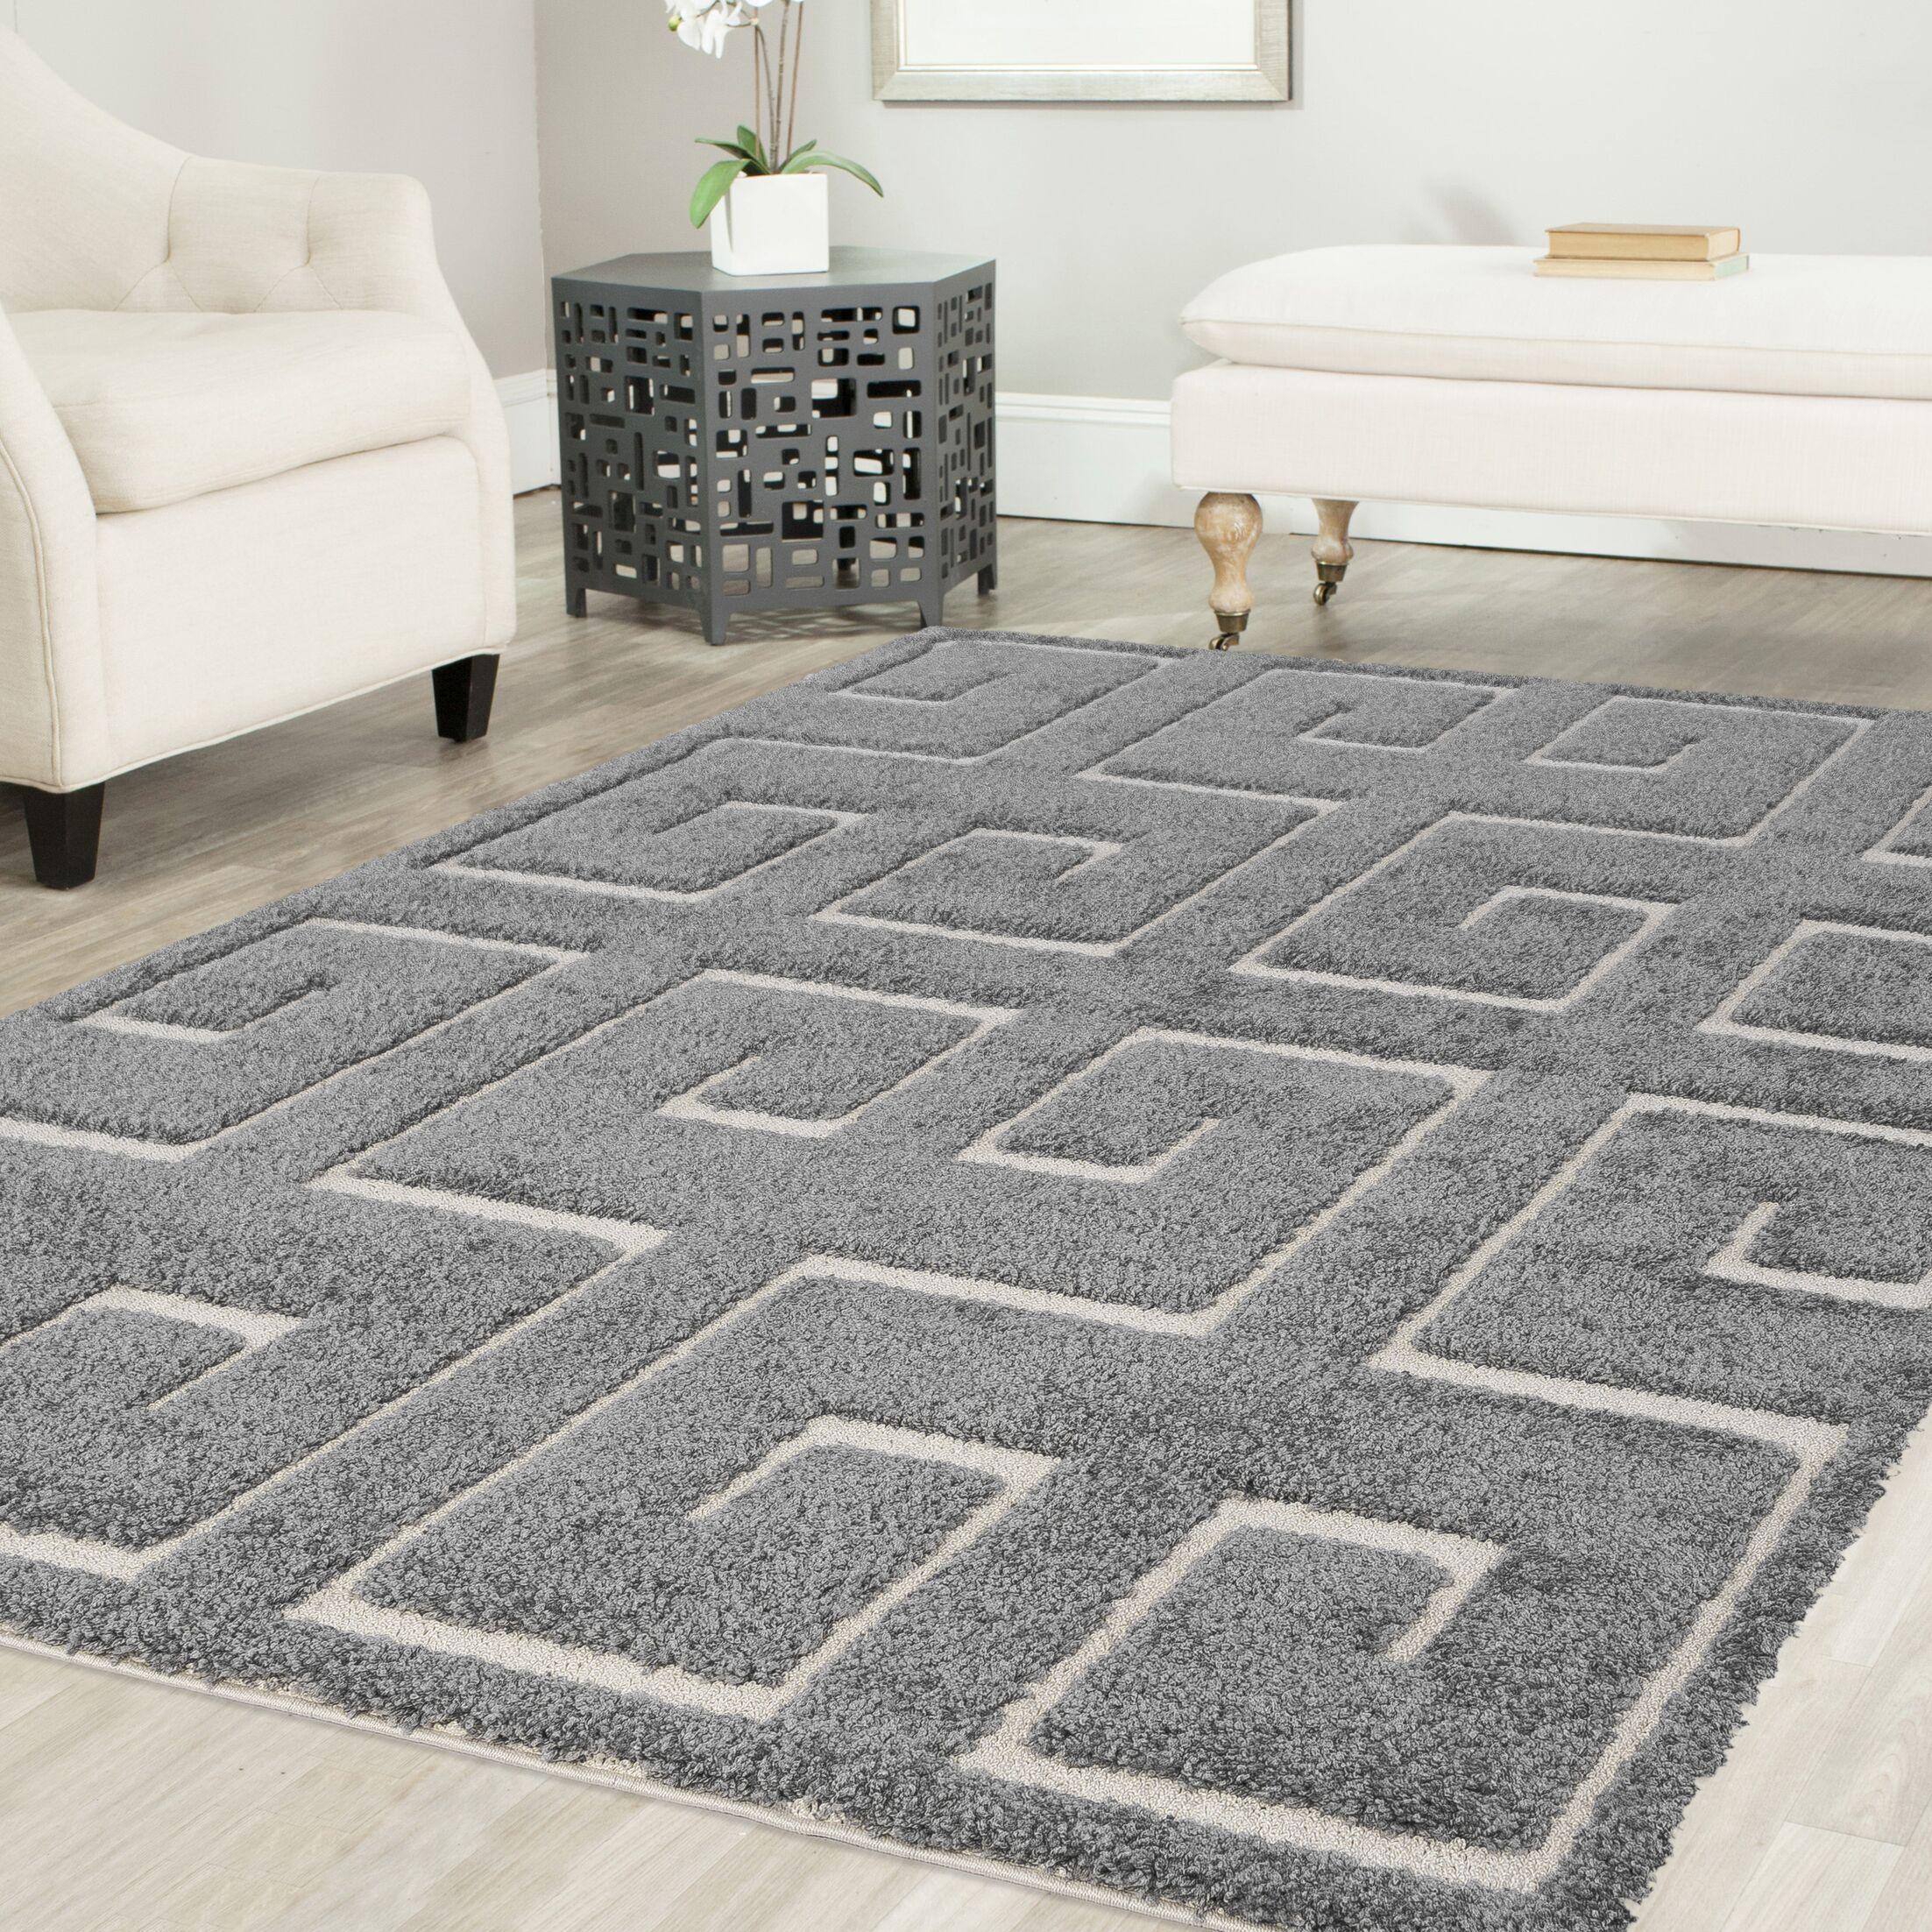 Artz Gray Area Rug Size: 8' x 10'